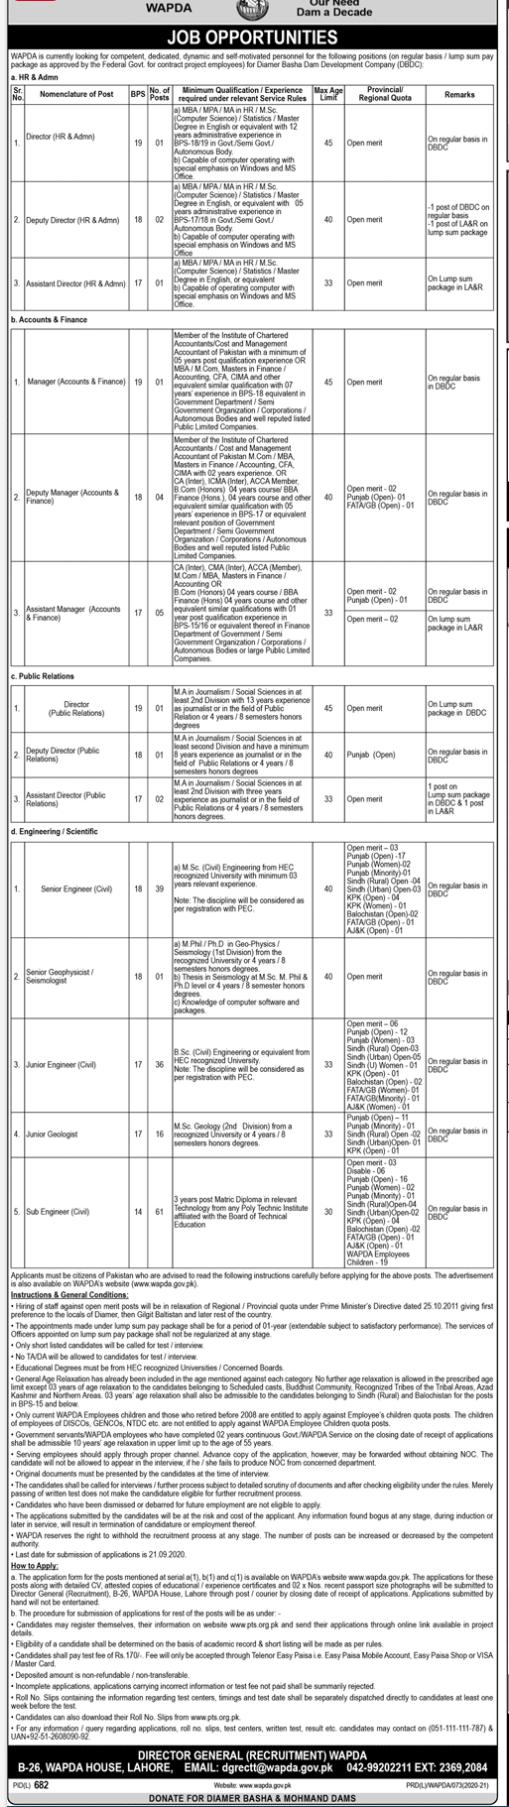 Water And Power Development Authority WAPDA Jobs September 2020 (171 Posts)